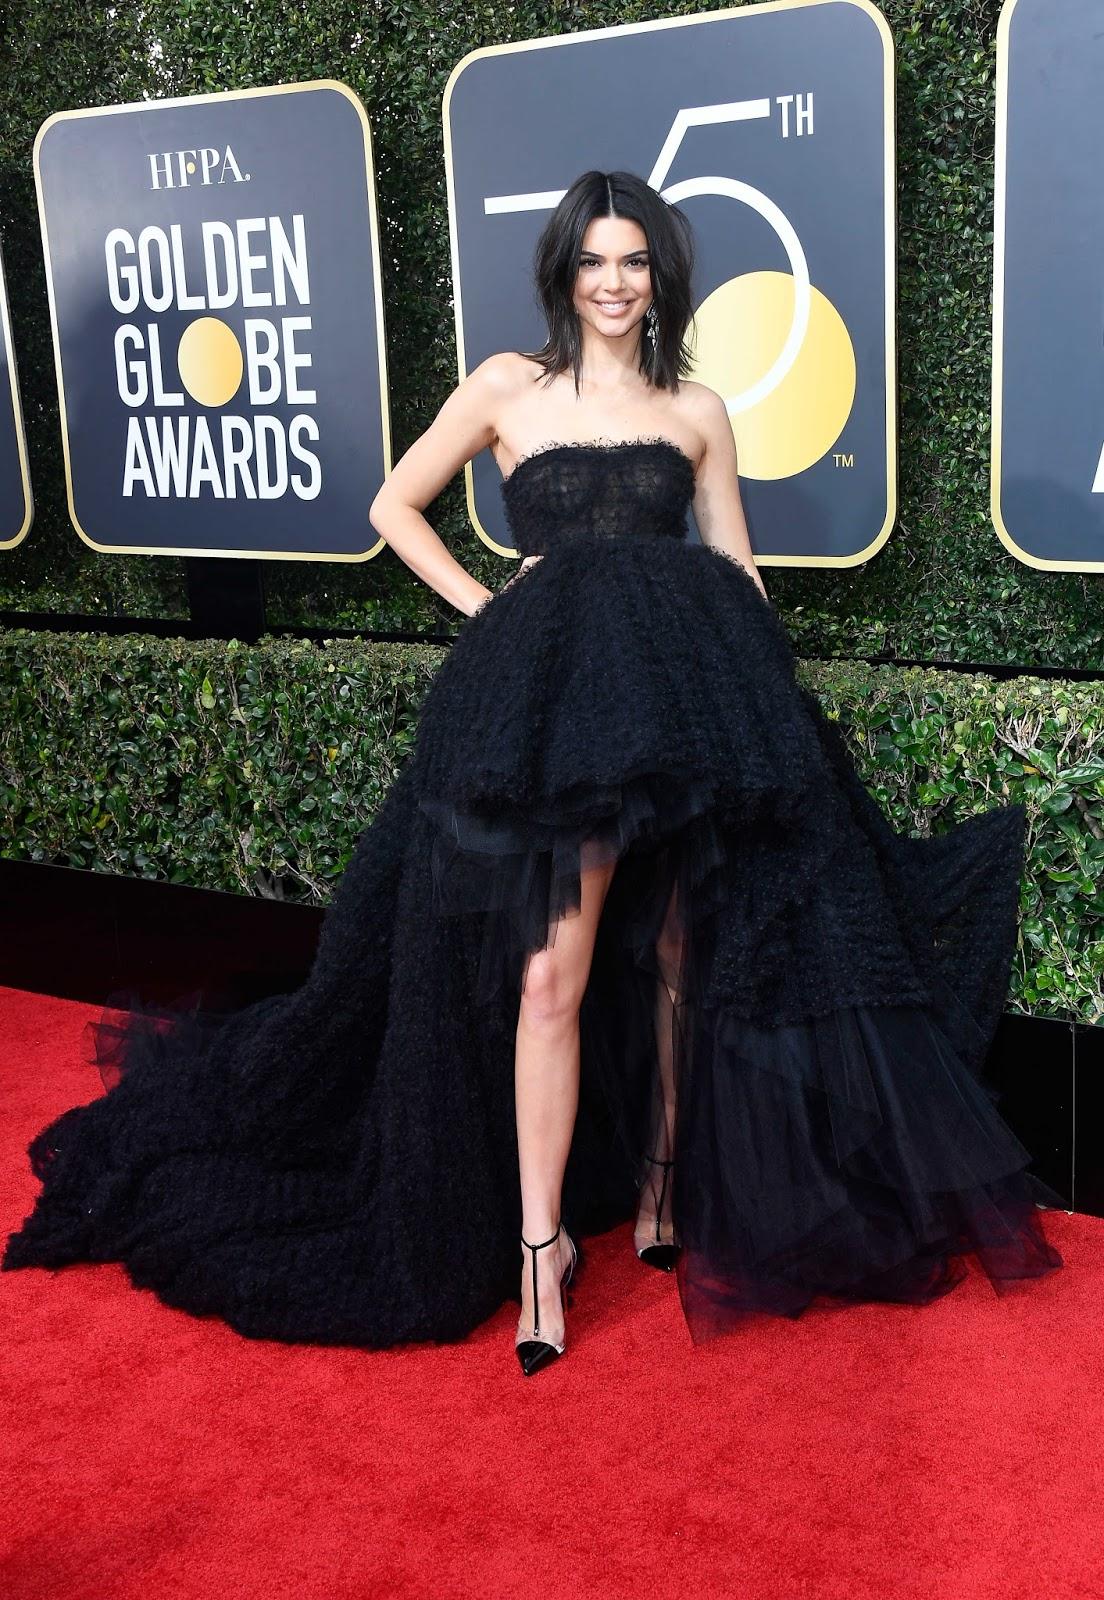 Kendall Jenner Posing at 75th Annual Golden Globe Awards